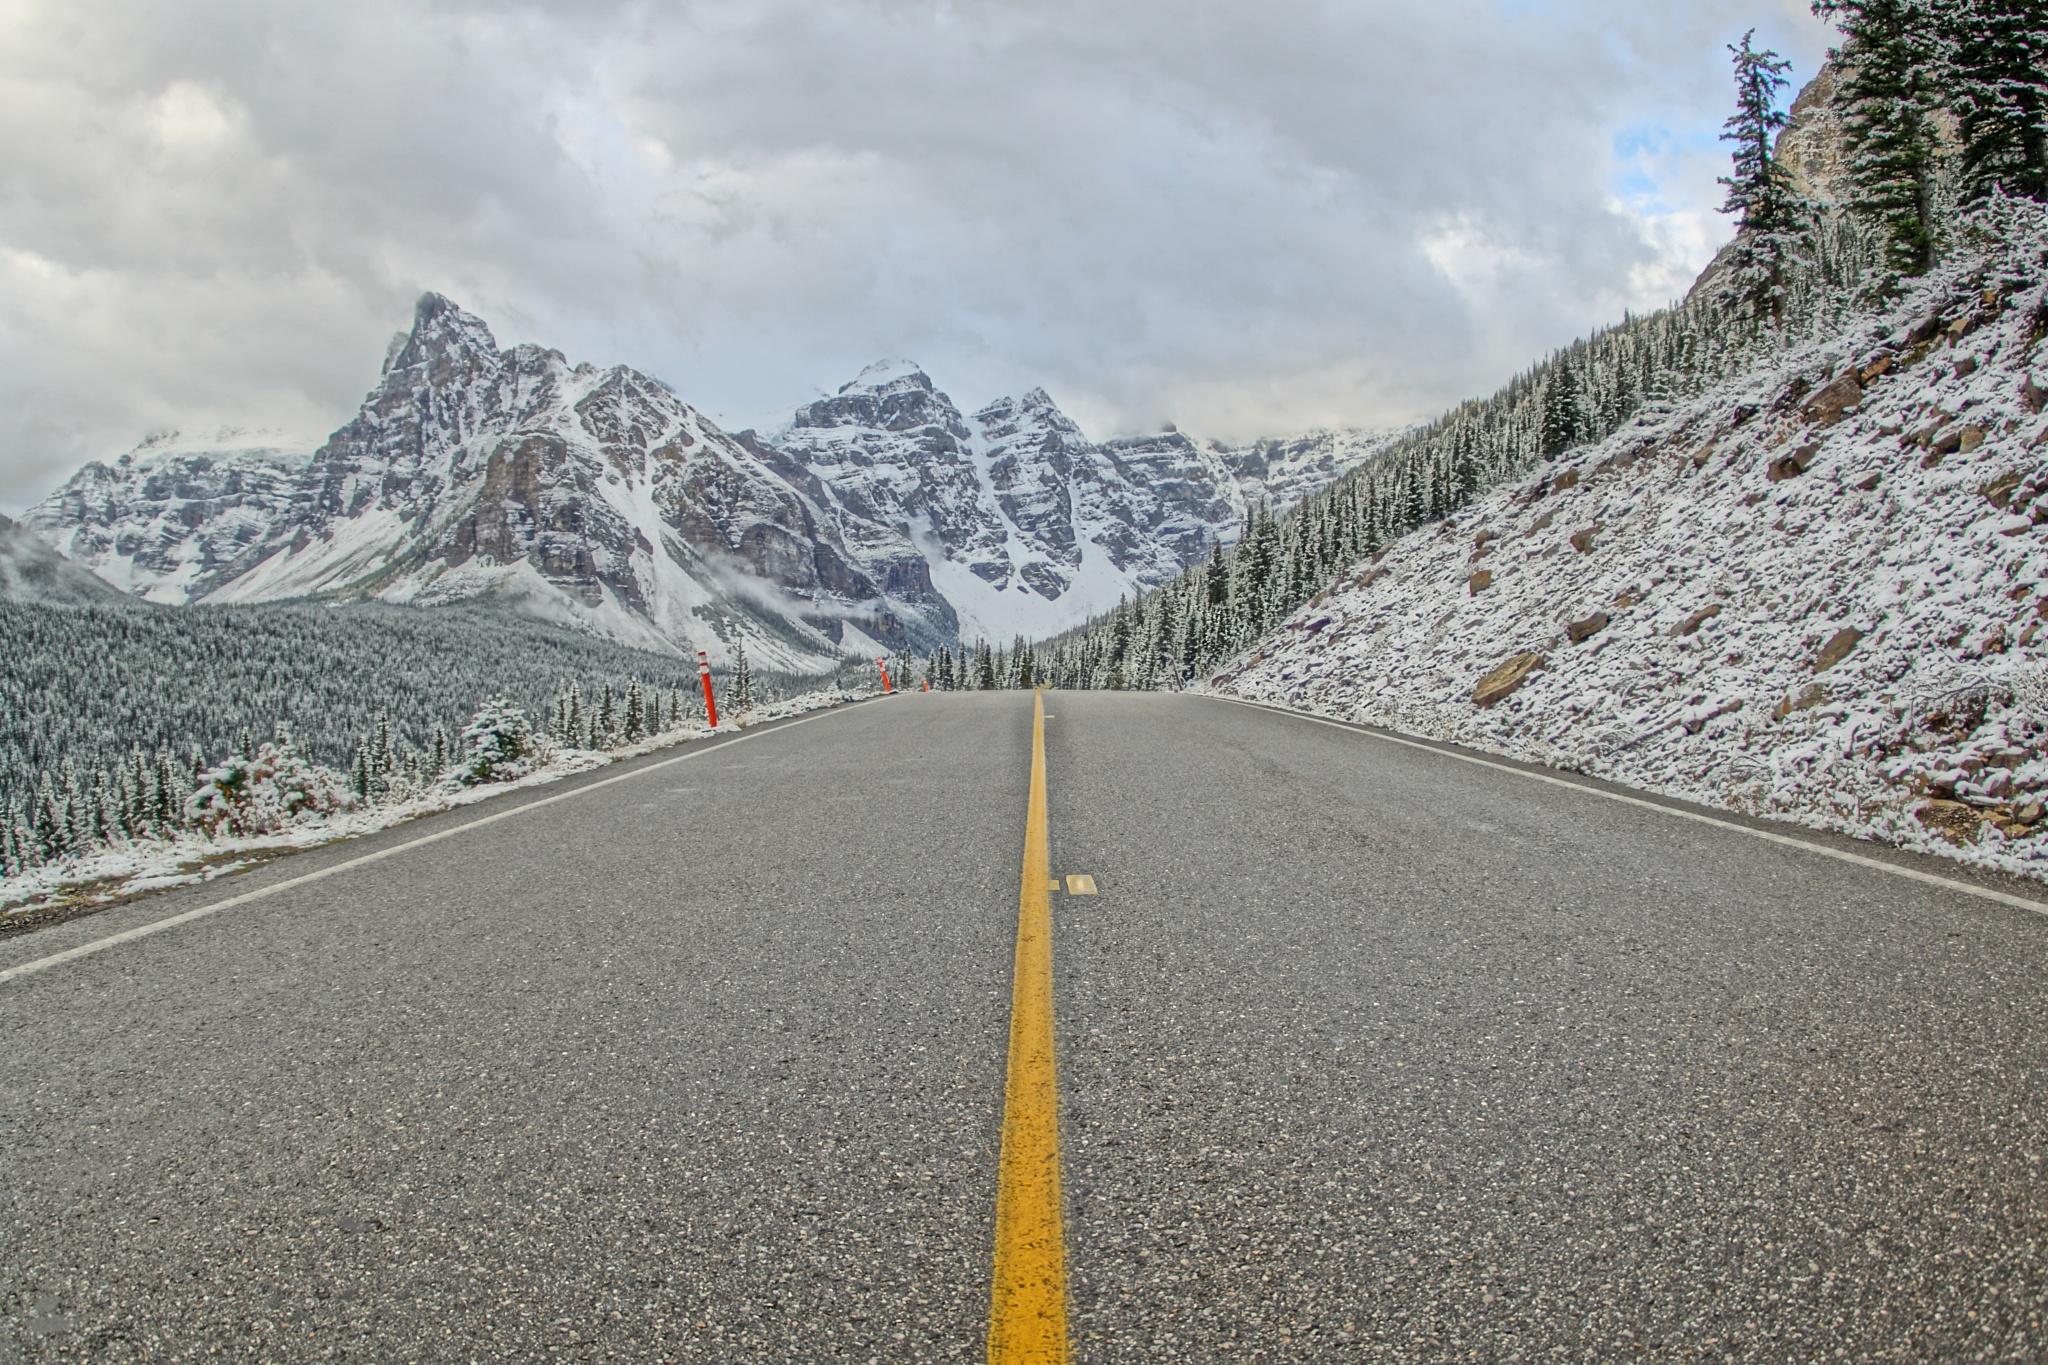 Heading to Moraine Lake by Ryan Kole